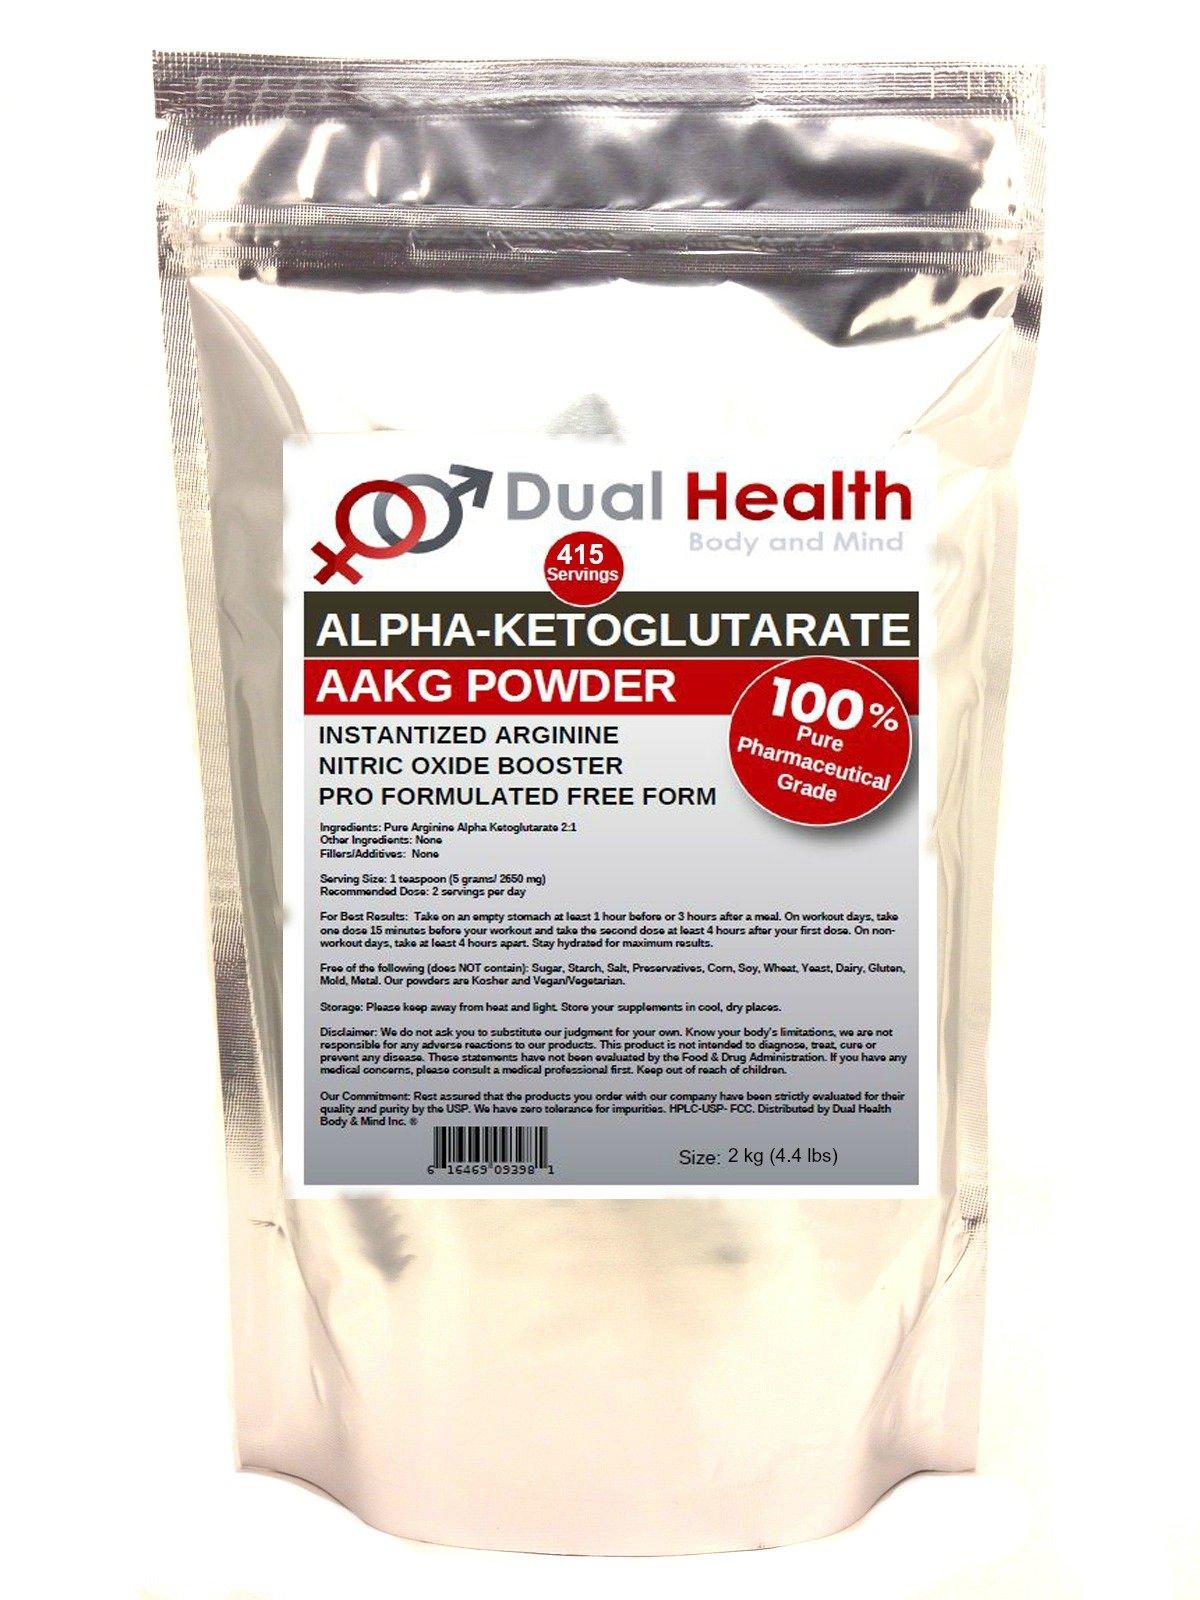 Pure AAKG (2kg (4.4 lbs)) L-Arginine Alpha-Ketoglutarate Powder Bulk Supplements